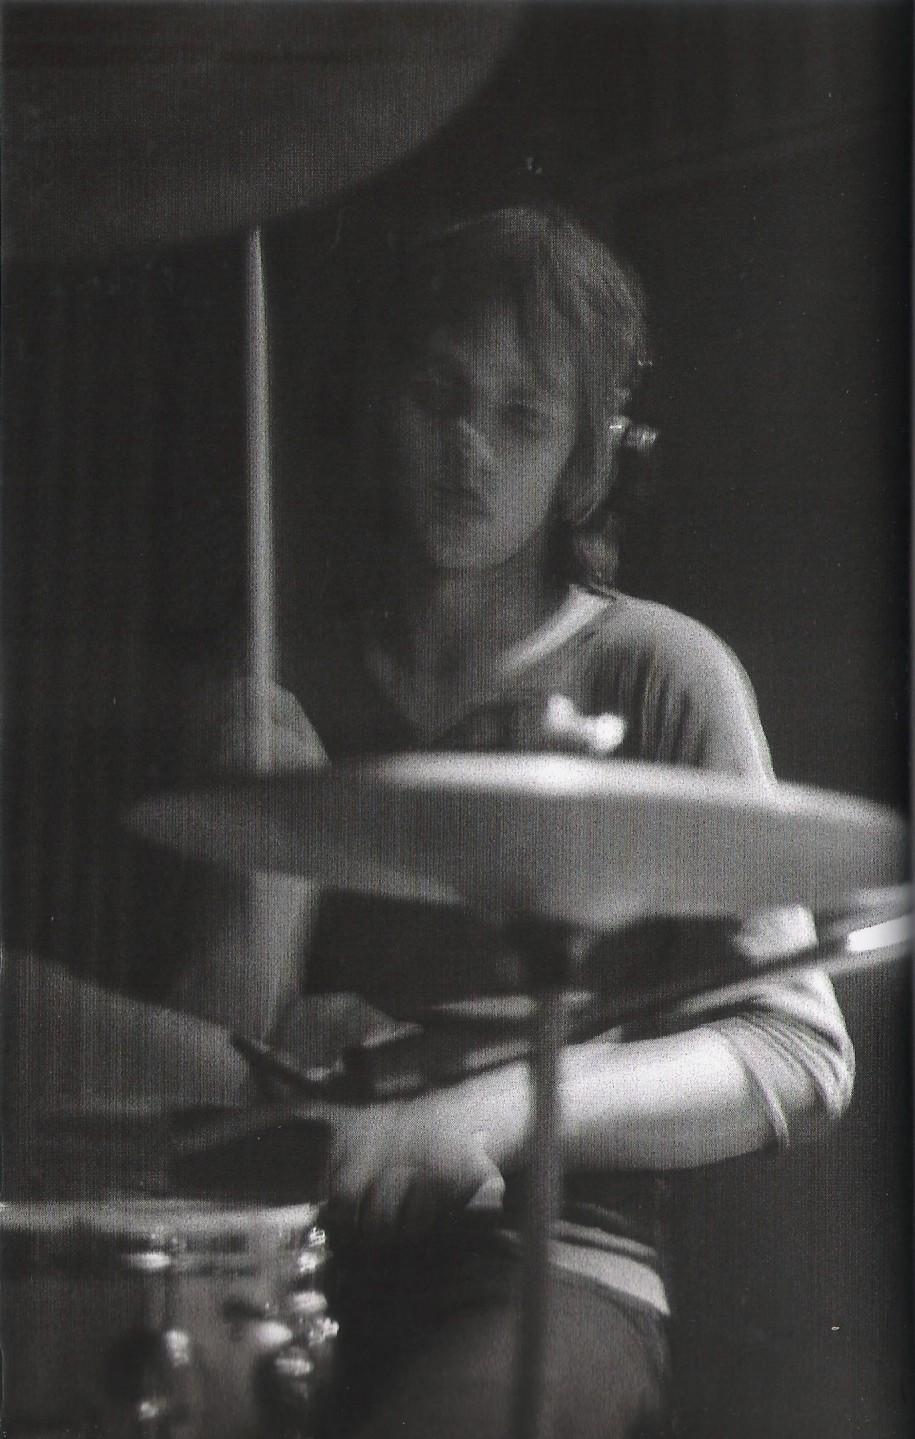 Roger Taylor podczas sesji w Trident Studios, czerwiec 1969 r.; fot.: Tim Staffell podczas sesji w Trident Studios, czerwiec 1969 r.; fot.: Paul Humberstone